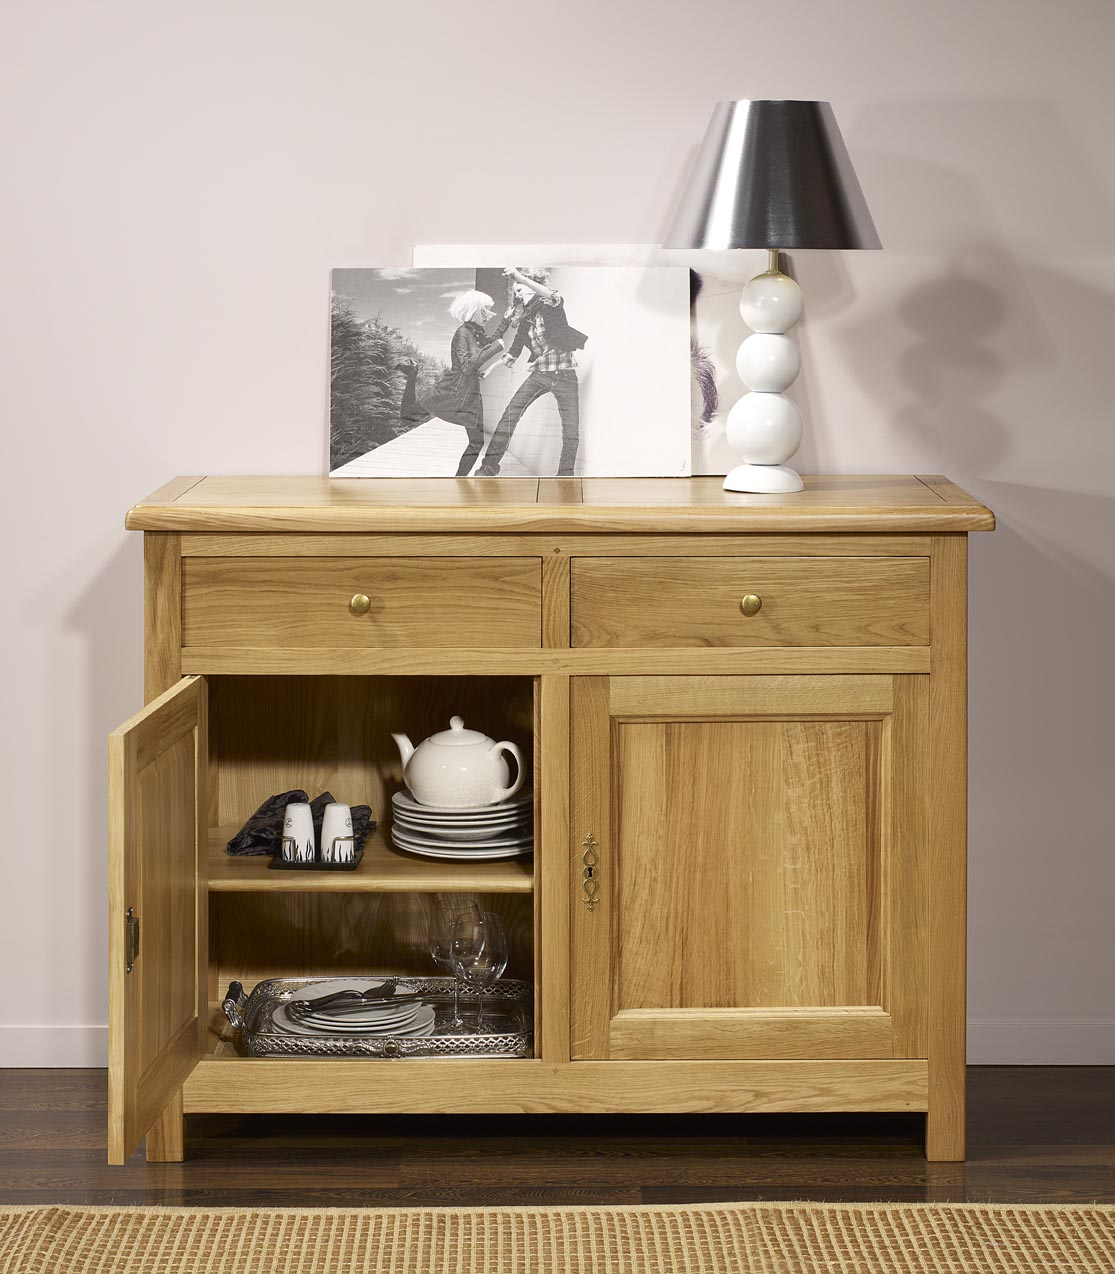 buffet 2 portes 2 tiroirs en ch ne massif de style campagnard meuble en ch ne massif. Black Bedroom Furniture Sets. Home Design Ideas